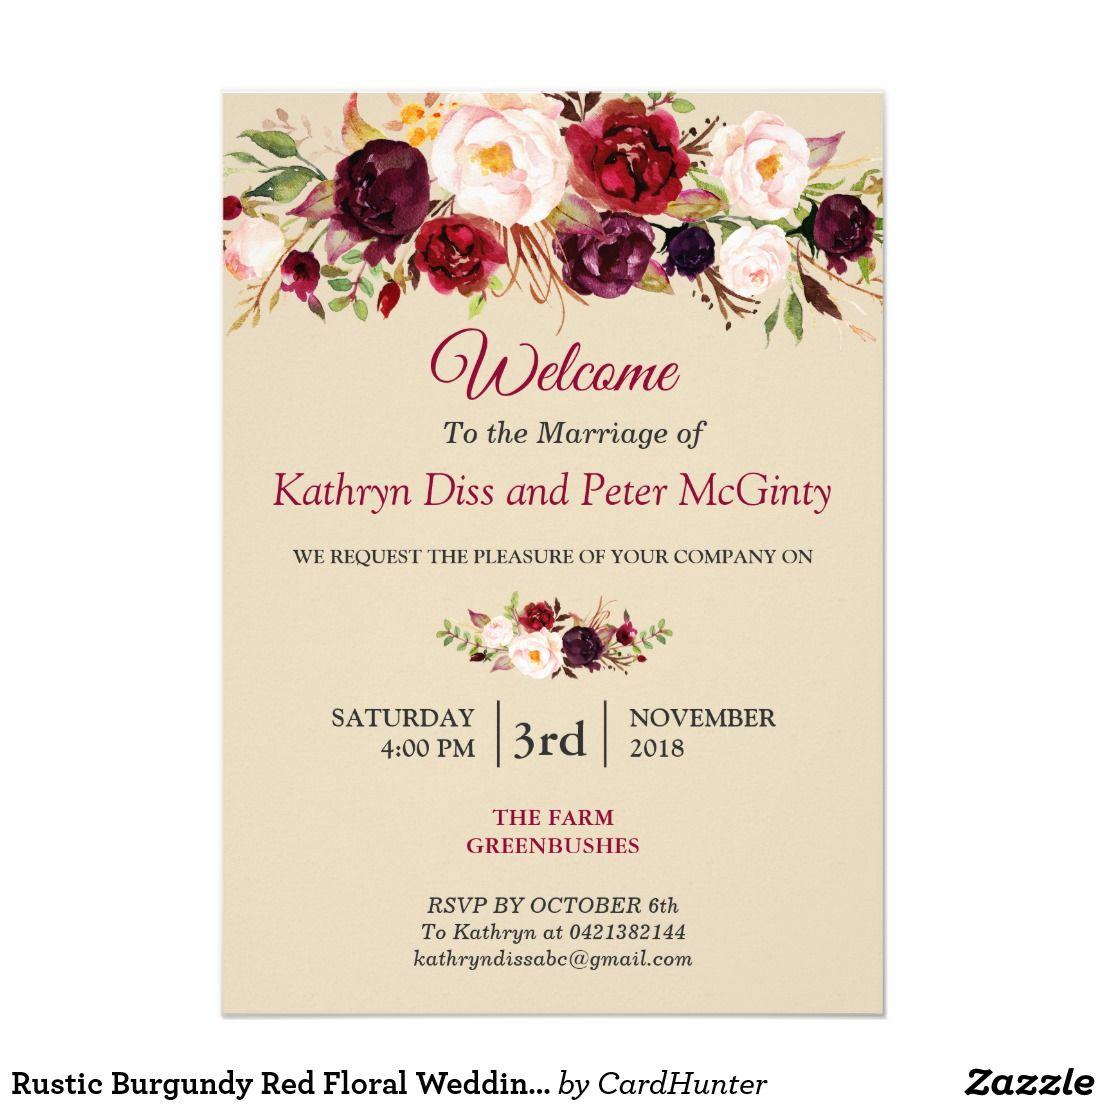 Rustic Burgundy Red Floral Wedding Vow Renewal Invitation  Wedding